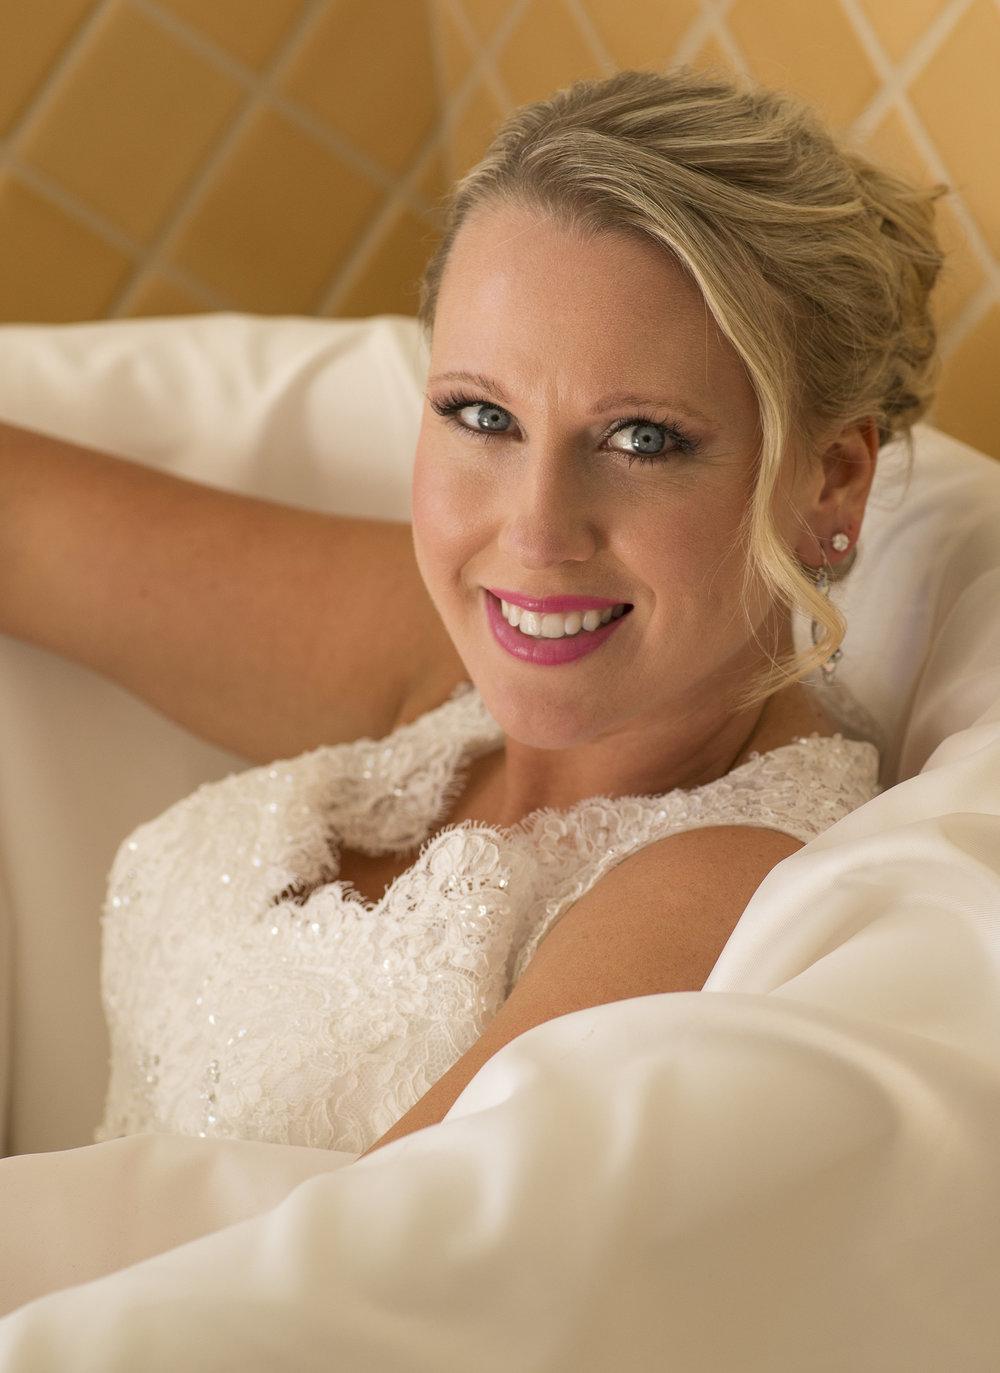 Brides and Weddings Shoot-belle grove style-0193.jpg